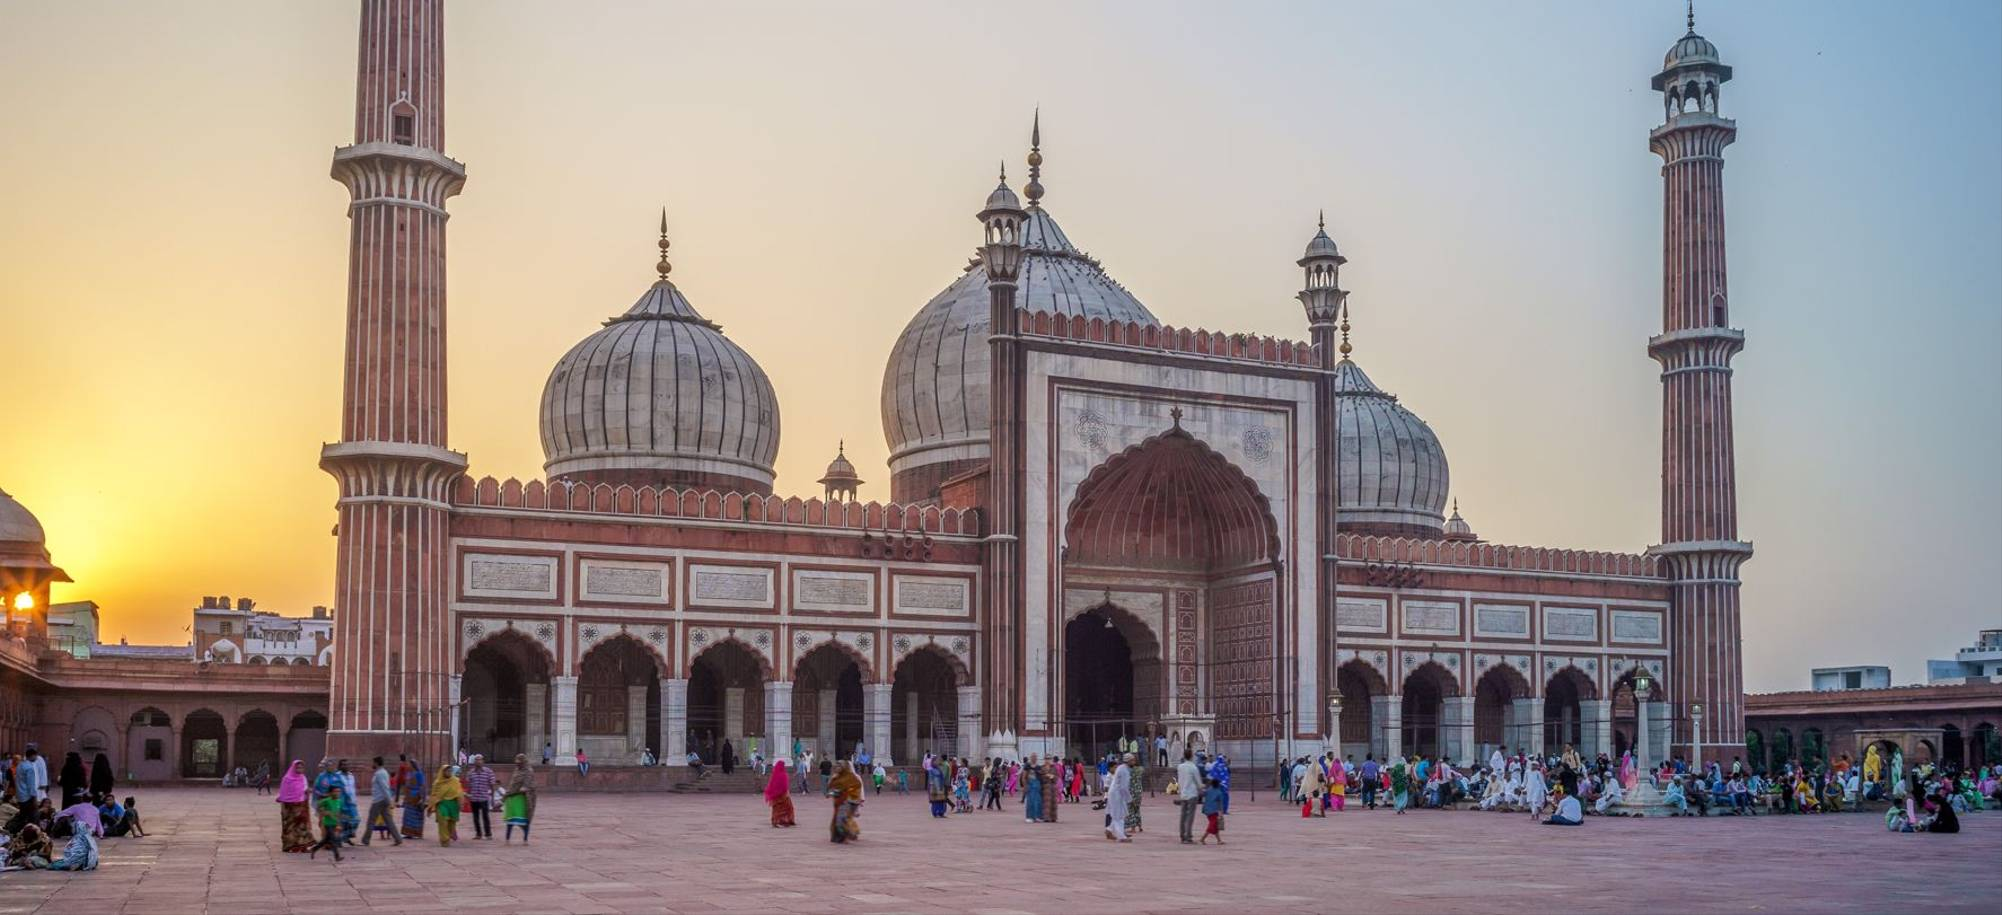 27 Day - Delhi, Jama Masjid - Itinerary Desktop.jpg